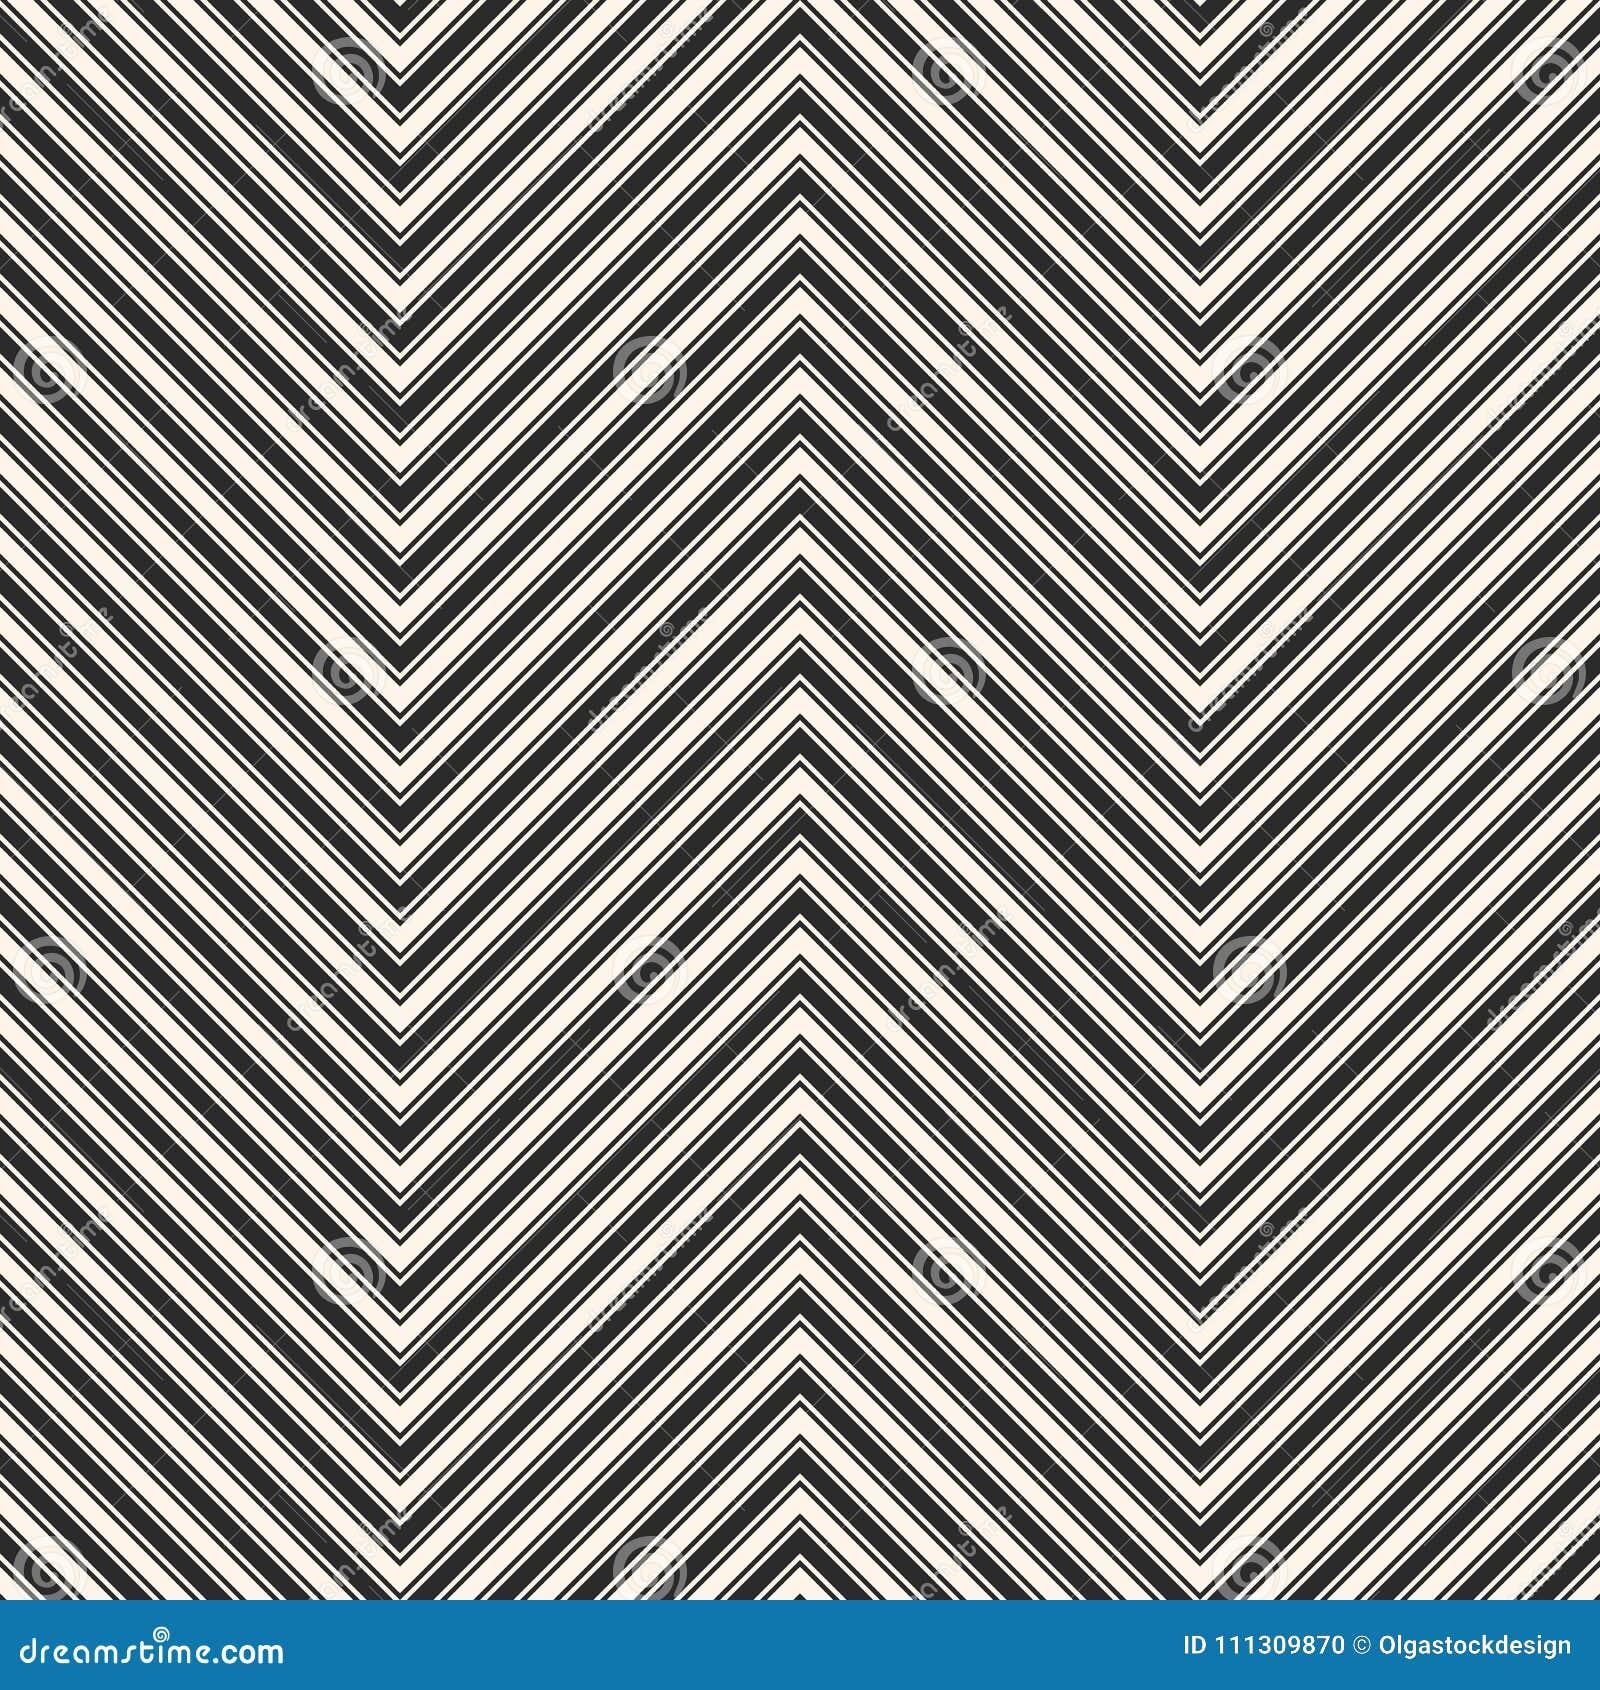 seamless mattress texture. Download Chevron Stripes Seamless Pattern. Vector Zigzag Texture. Stock - Illustration Of Diagonal Mattress Texture